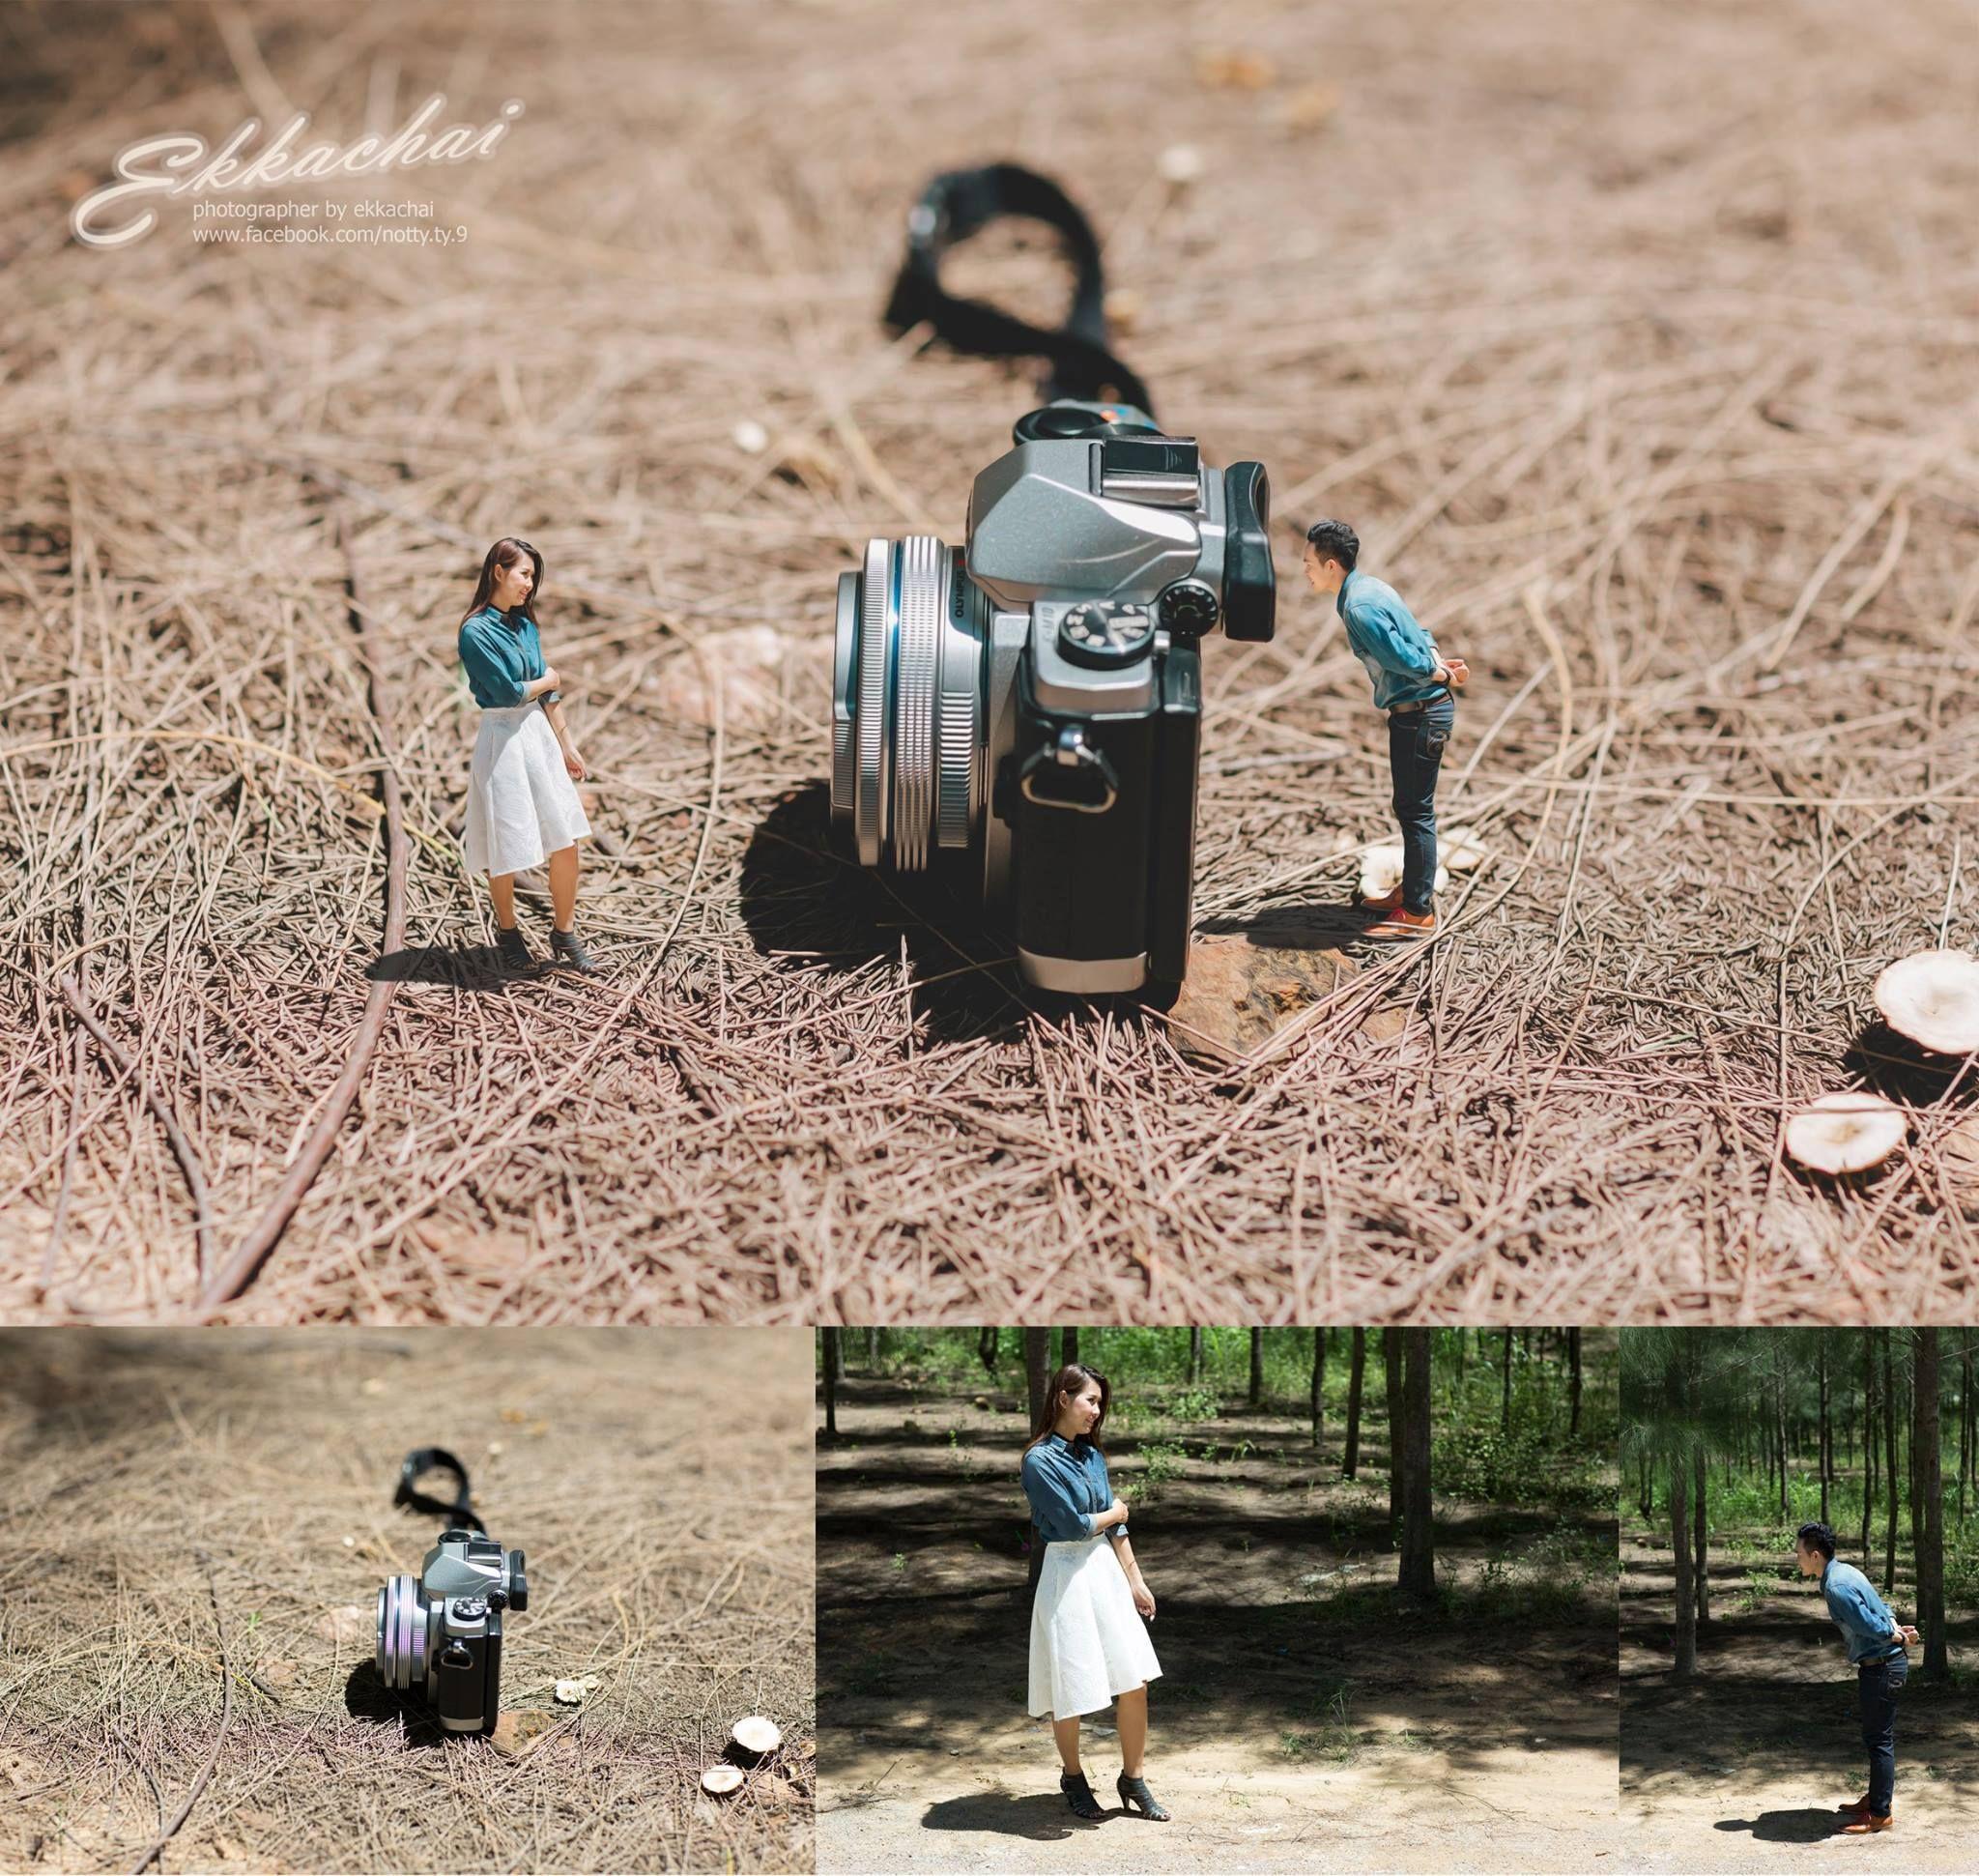 Ekkachai Saelow | cool | Pinterest | Photoshop, Miniatures ...